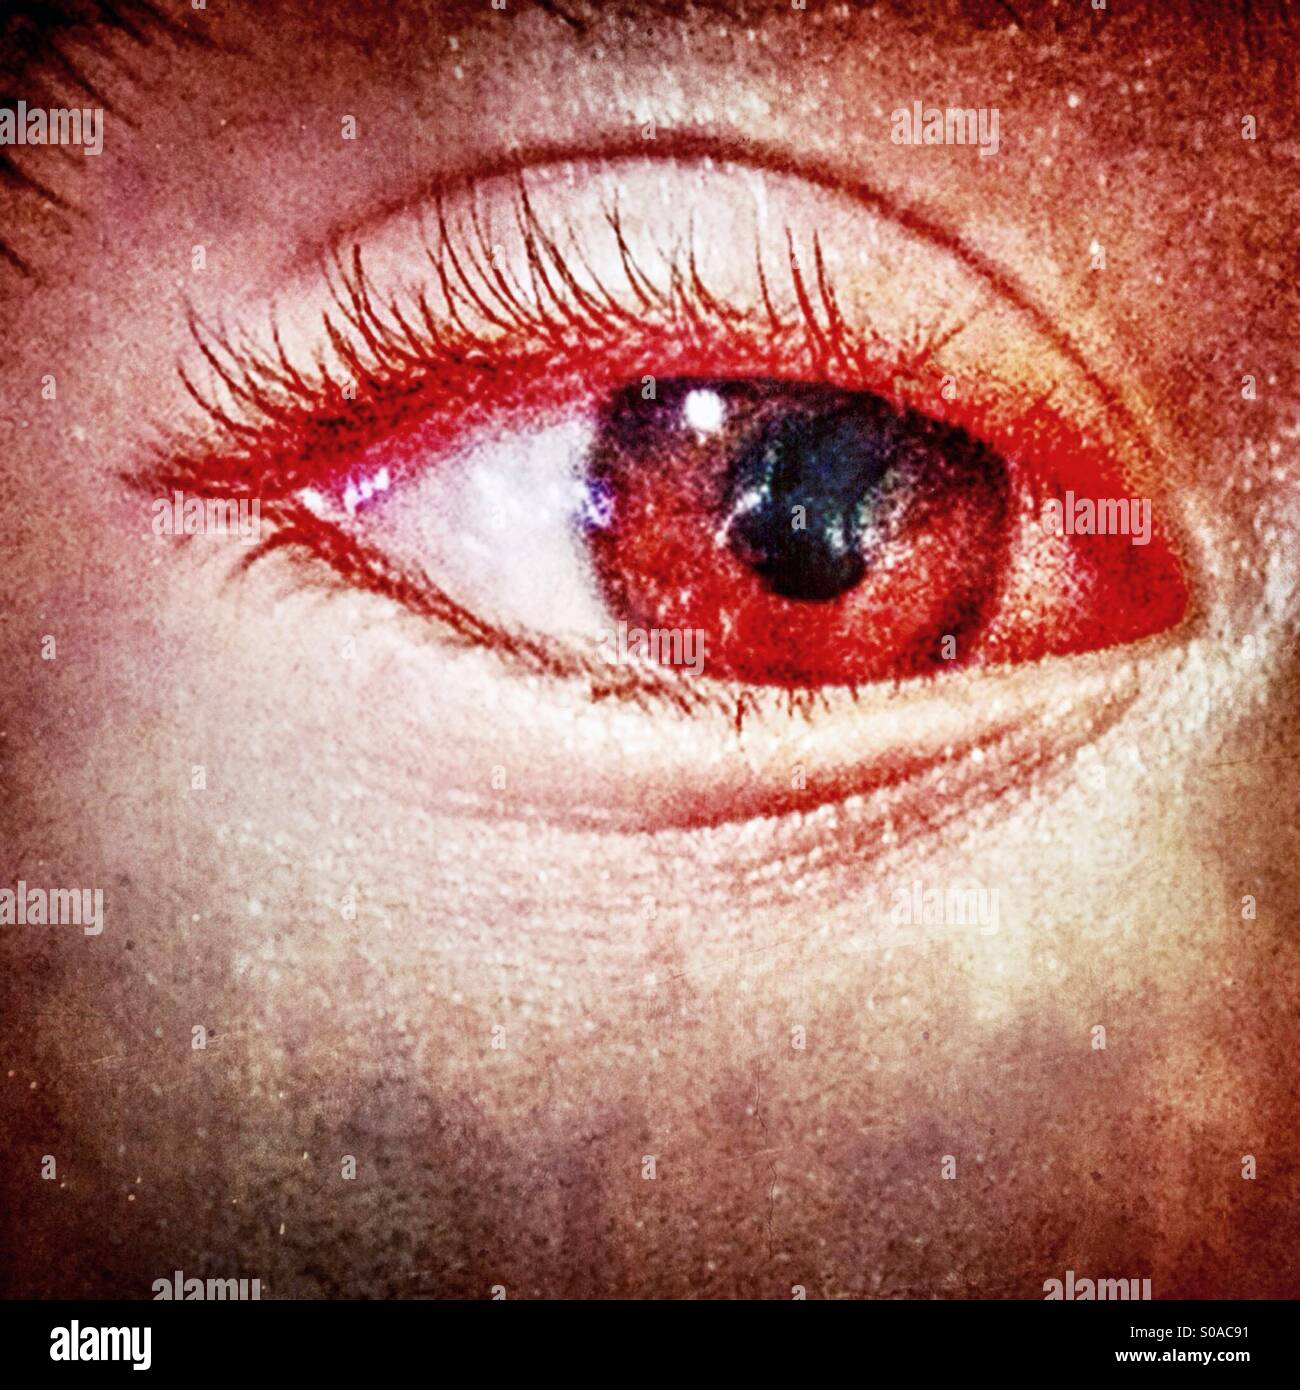 Primer plano de un ojo humano. Imagen De Stock